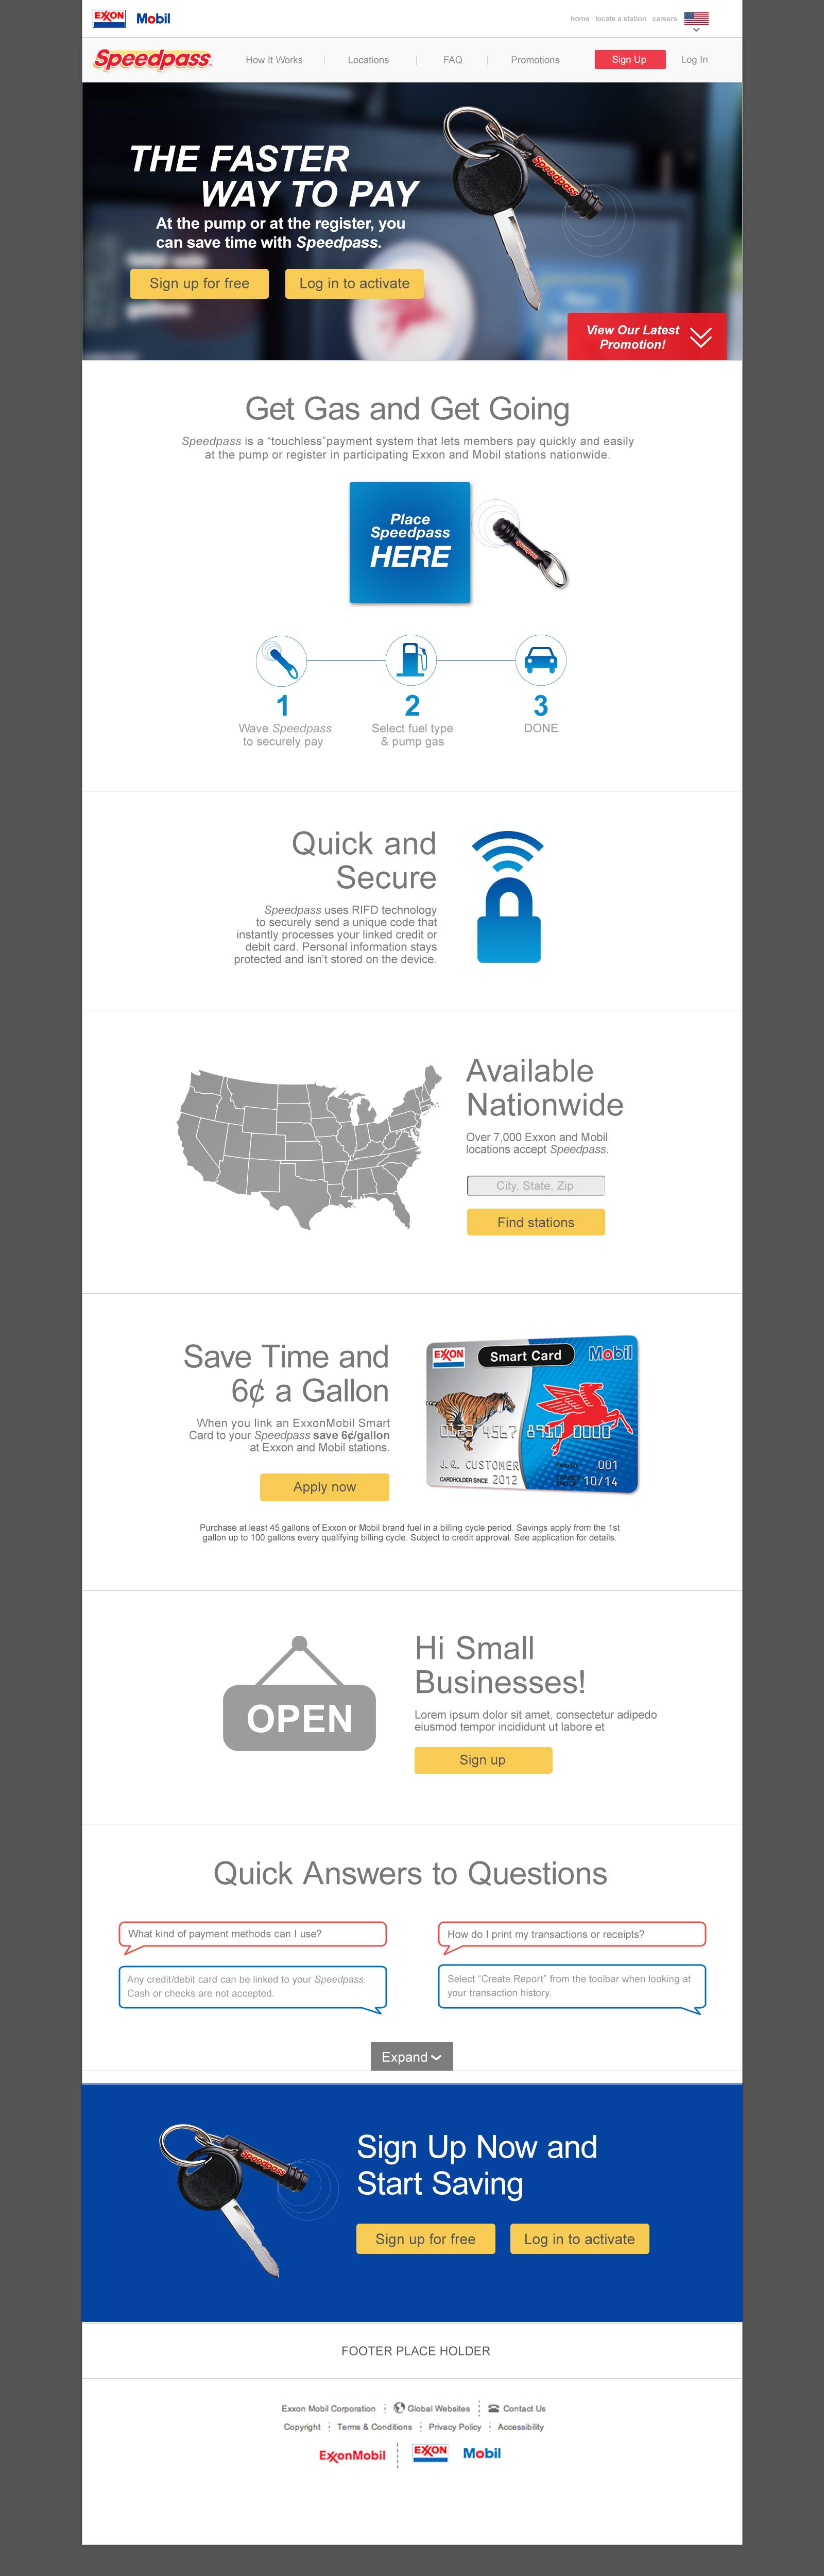 Speedpass_website_design.jpg